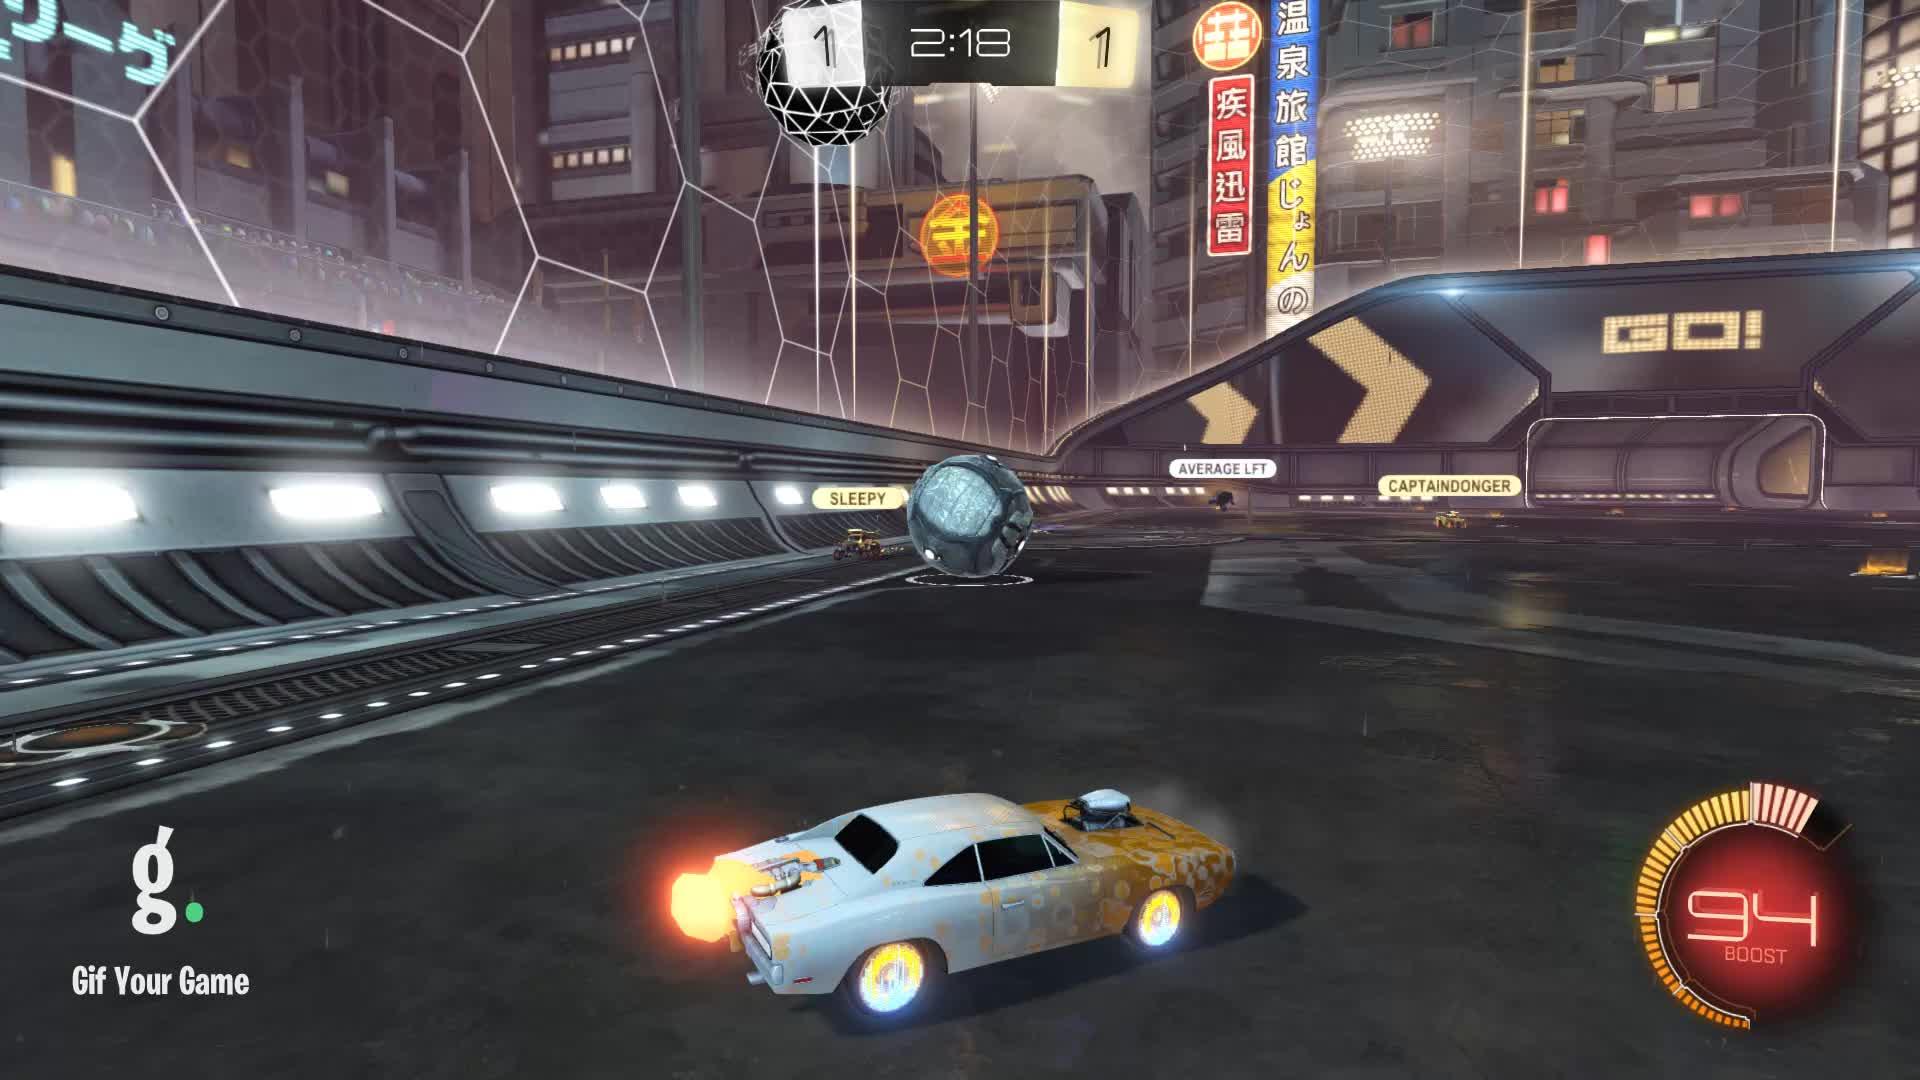 Gif Your Game, GifYourGame, Rocket League, RocketLeague, Save, datboi, Save 3: datboi GIFs